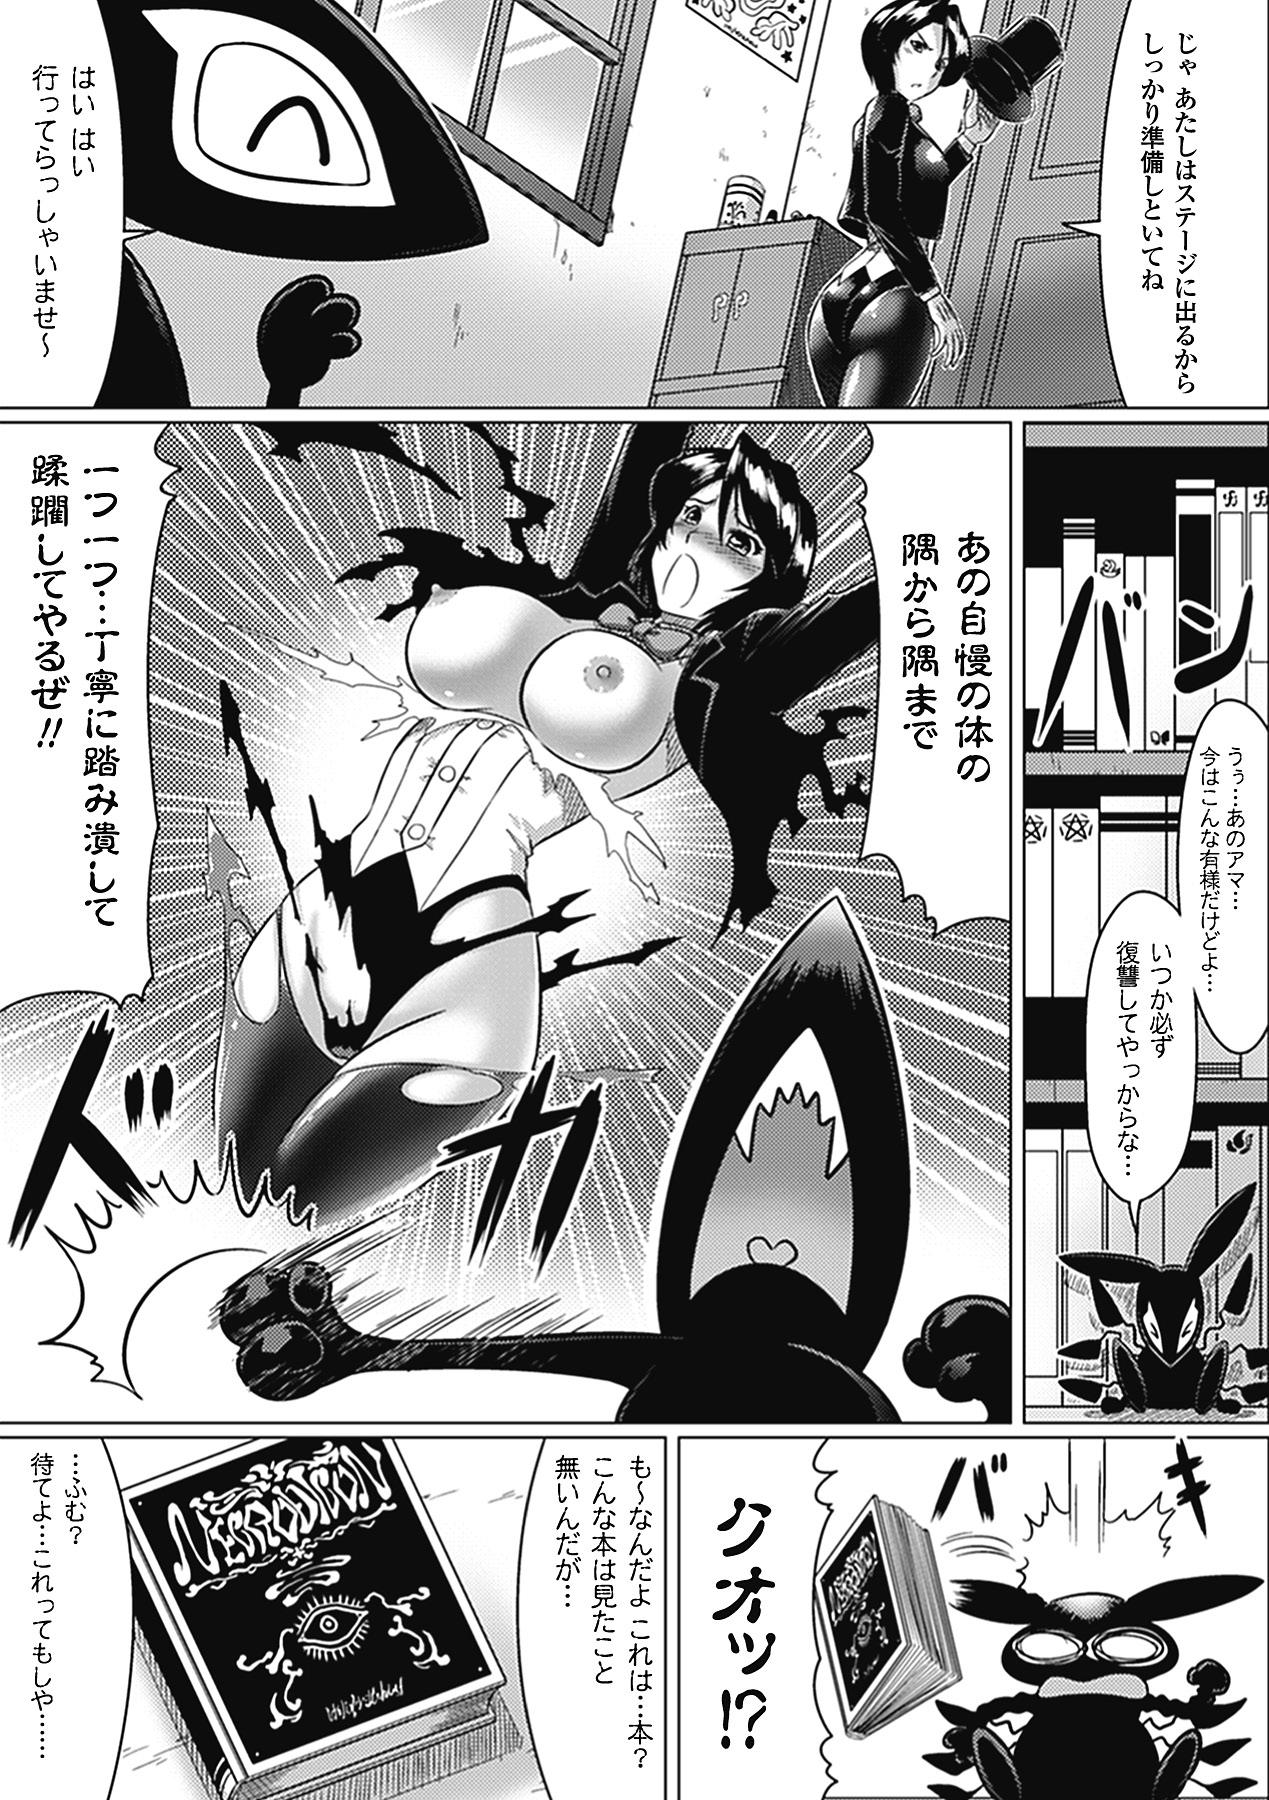 Megami Crisis 1 143